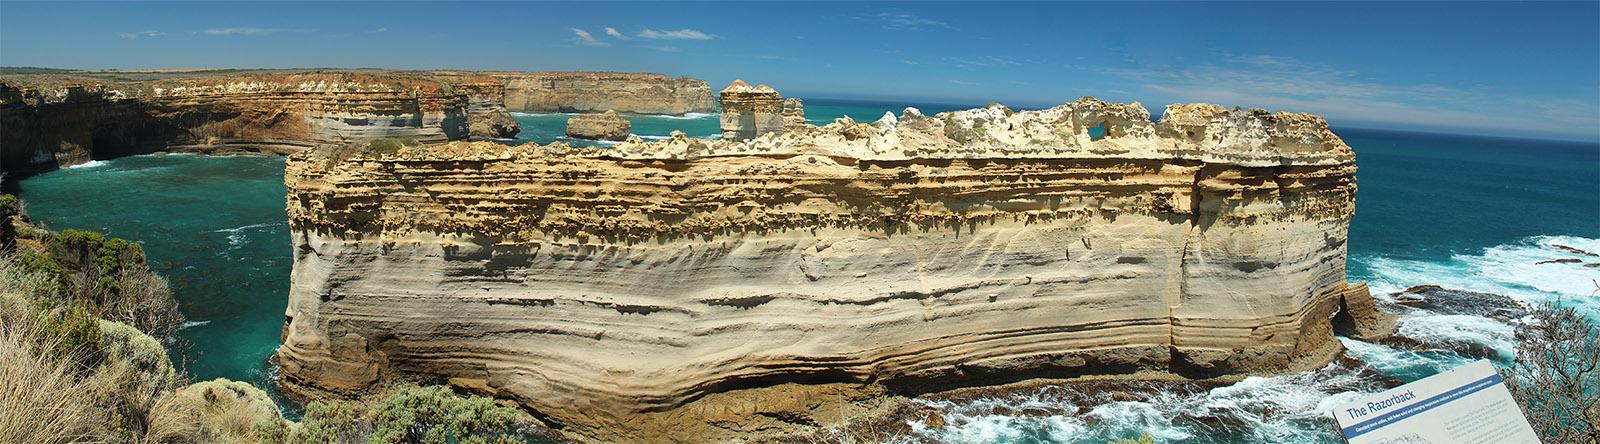 Razorback panorama